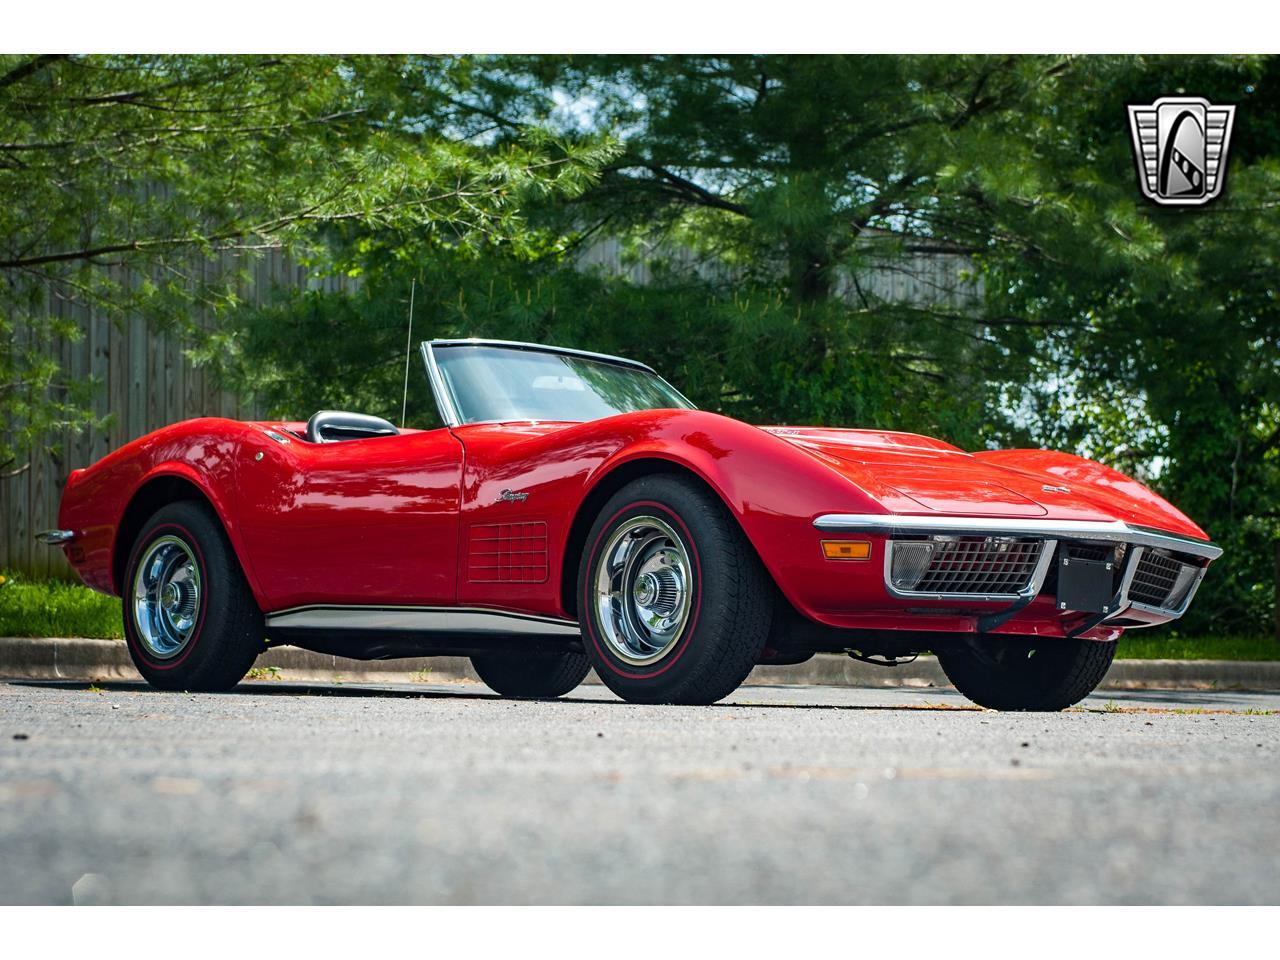 Large Picture of '71 Corvette located in Illinois - QB9M